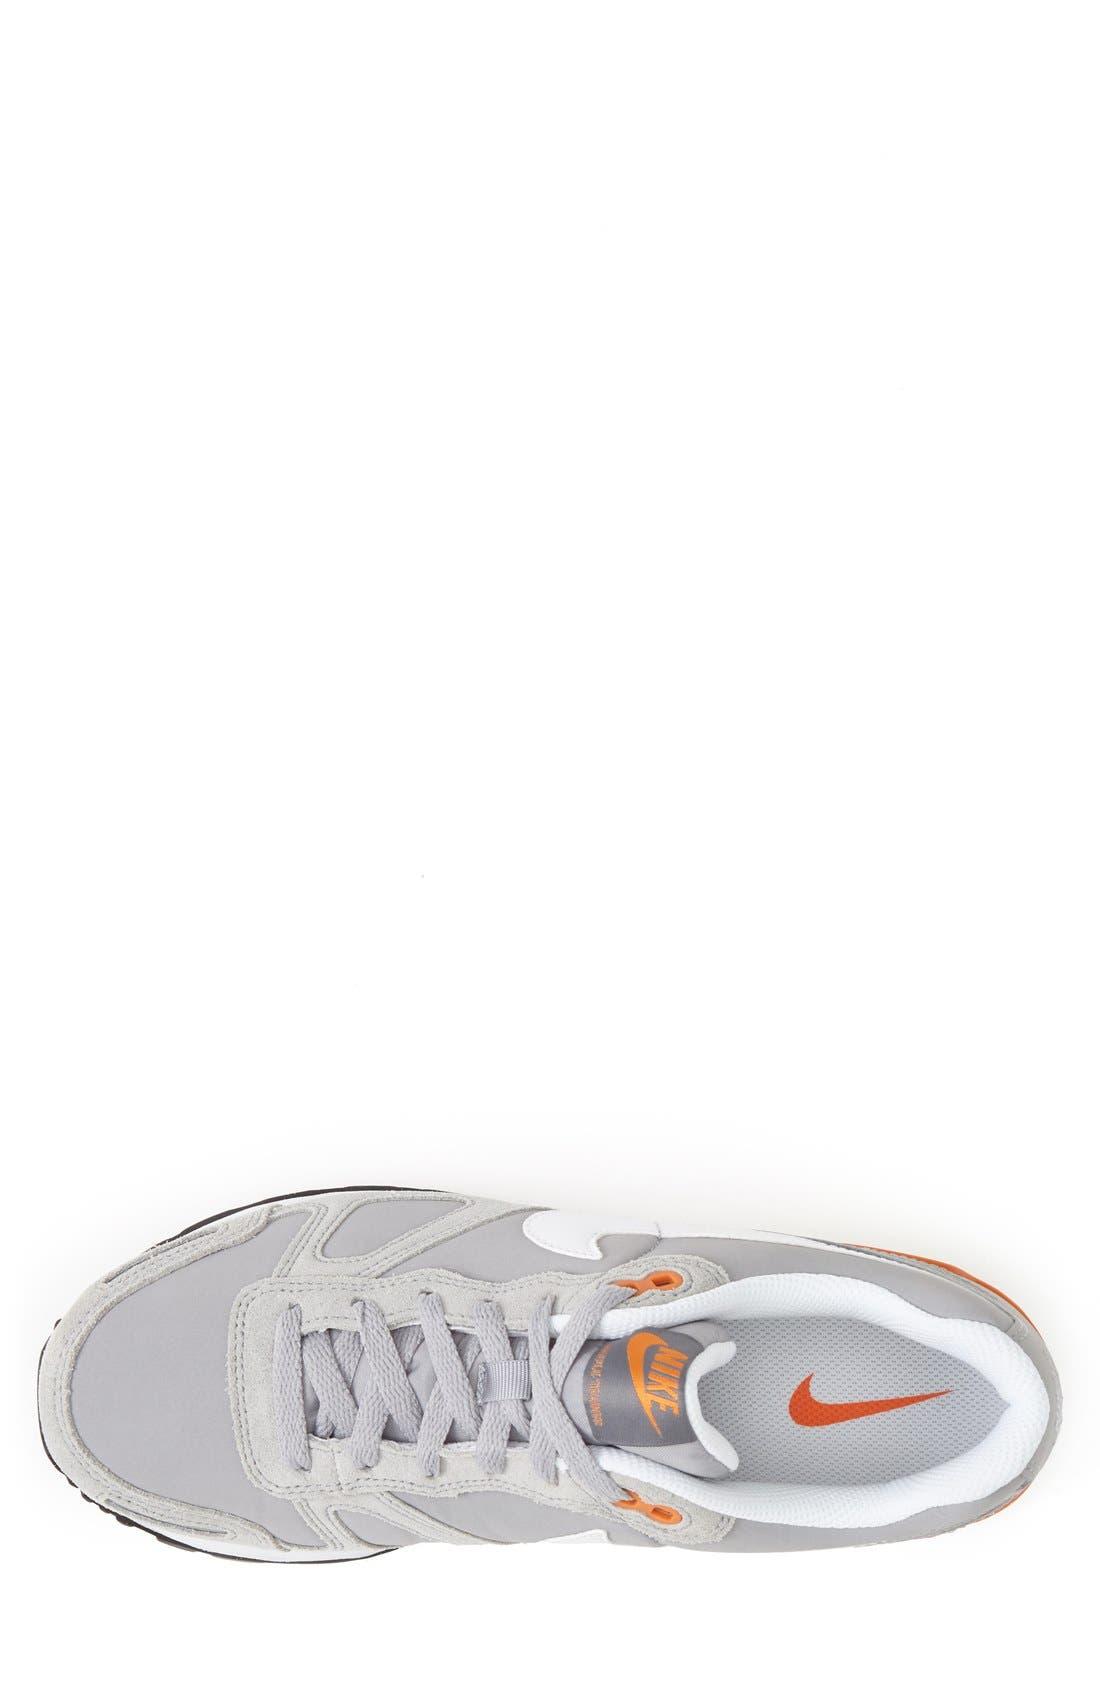 NIKE,                             'Air Waffle Trainer' Sneaker,                             Alternate thumbnail 2, color,                             062